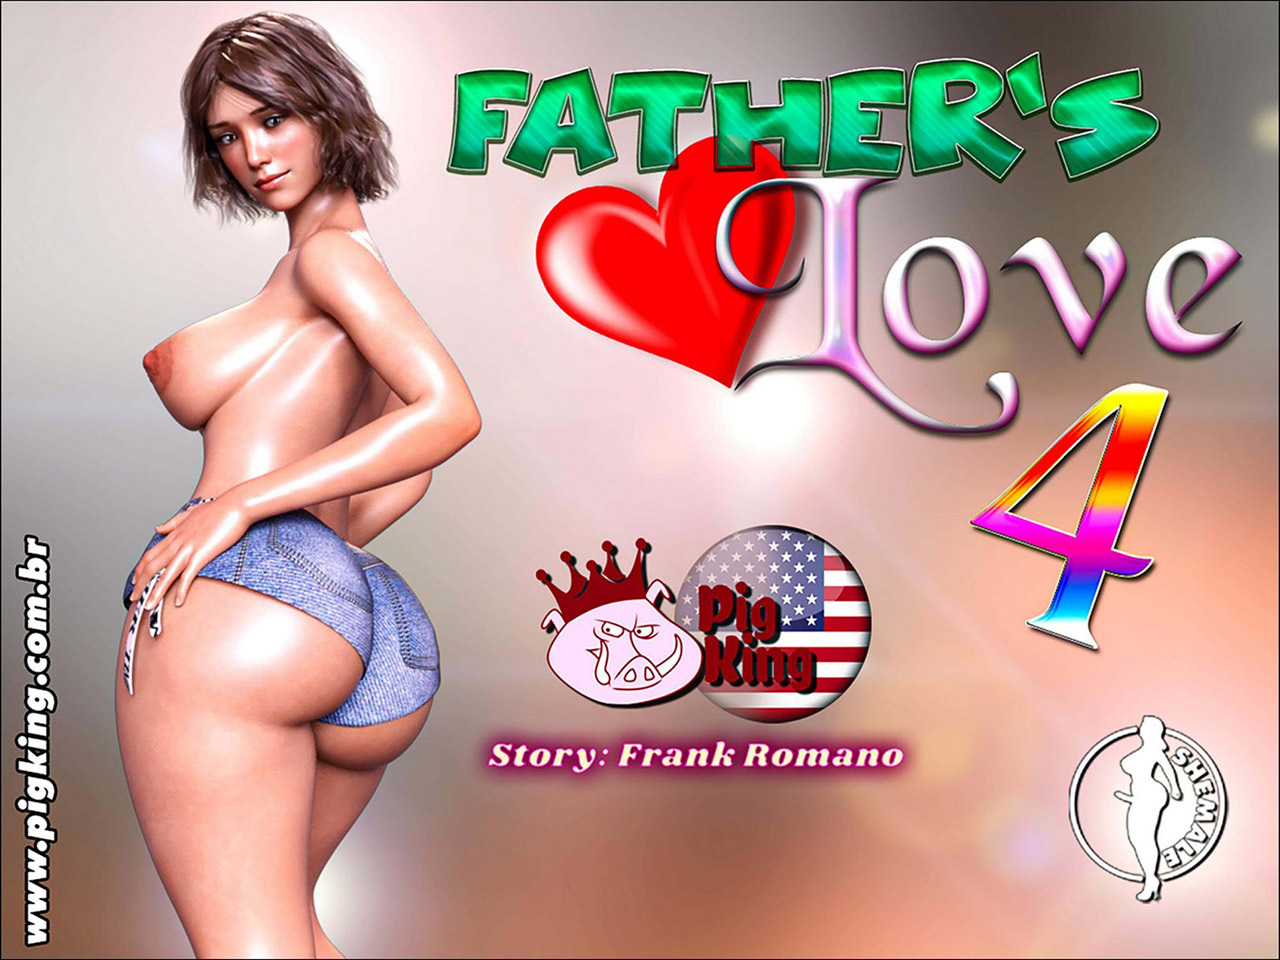 FATHERS LOVE parte 4